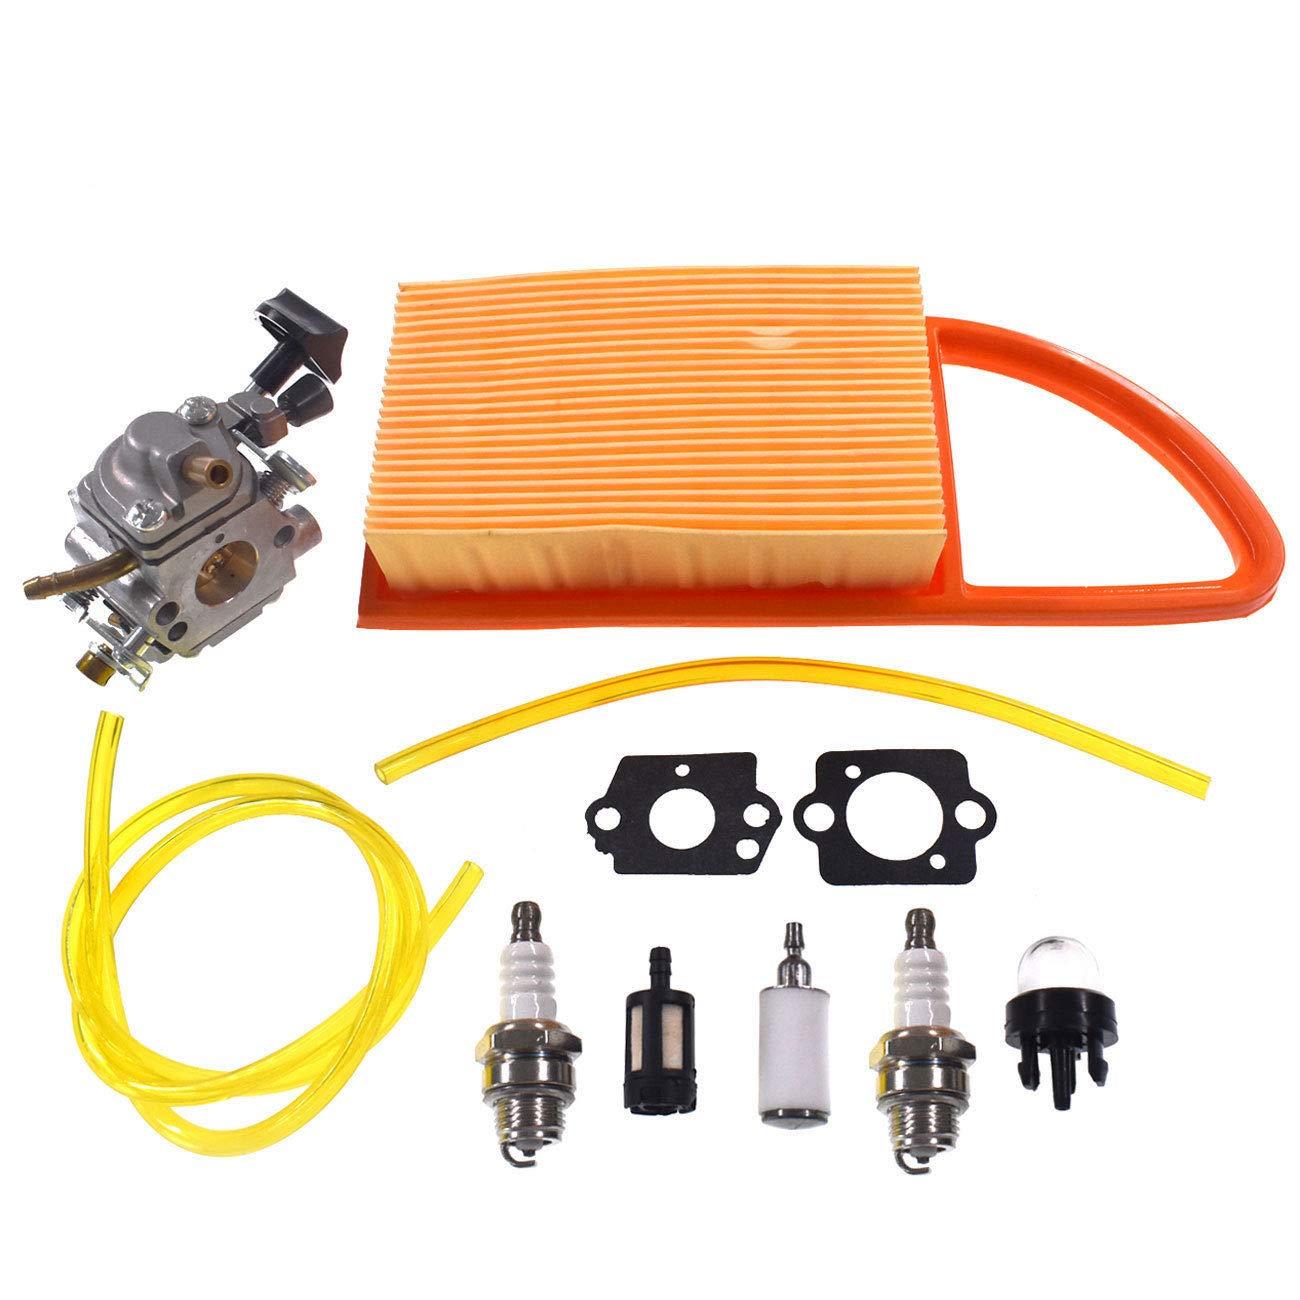 FidgetKute Carburetor Spark Plug & Gasket to Fit Stihl BR500 BR550 BR600 C1Q-S183 Carb by FidgetKute